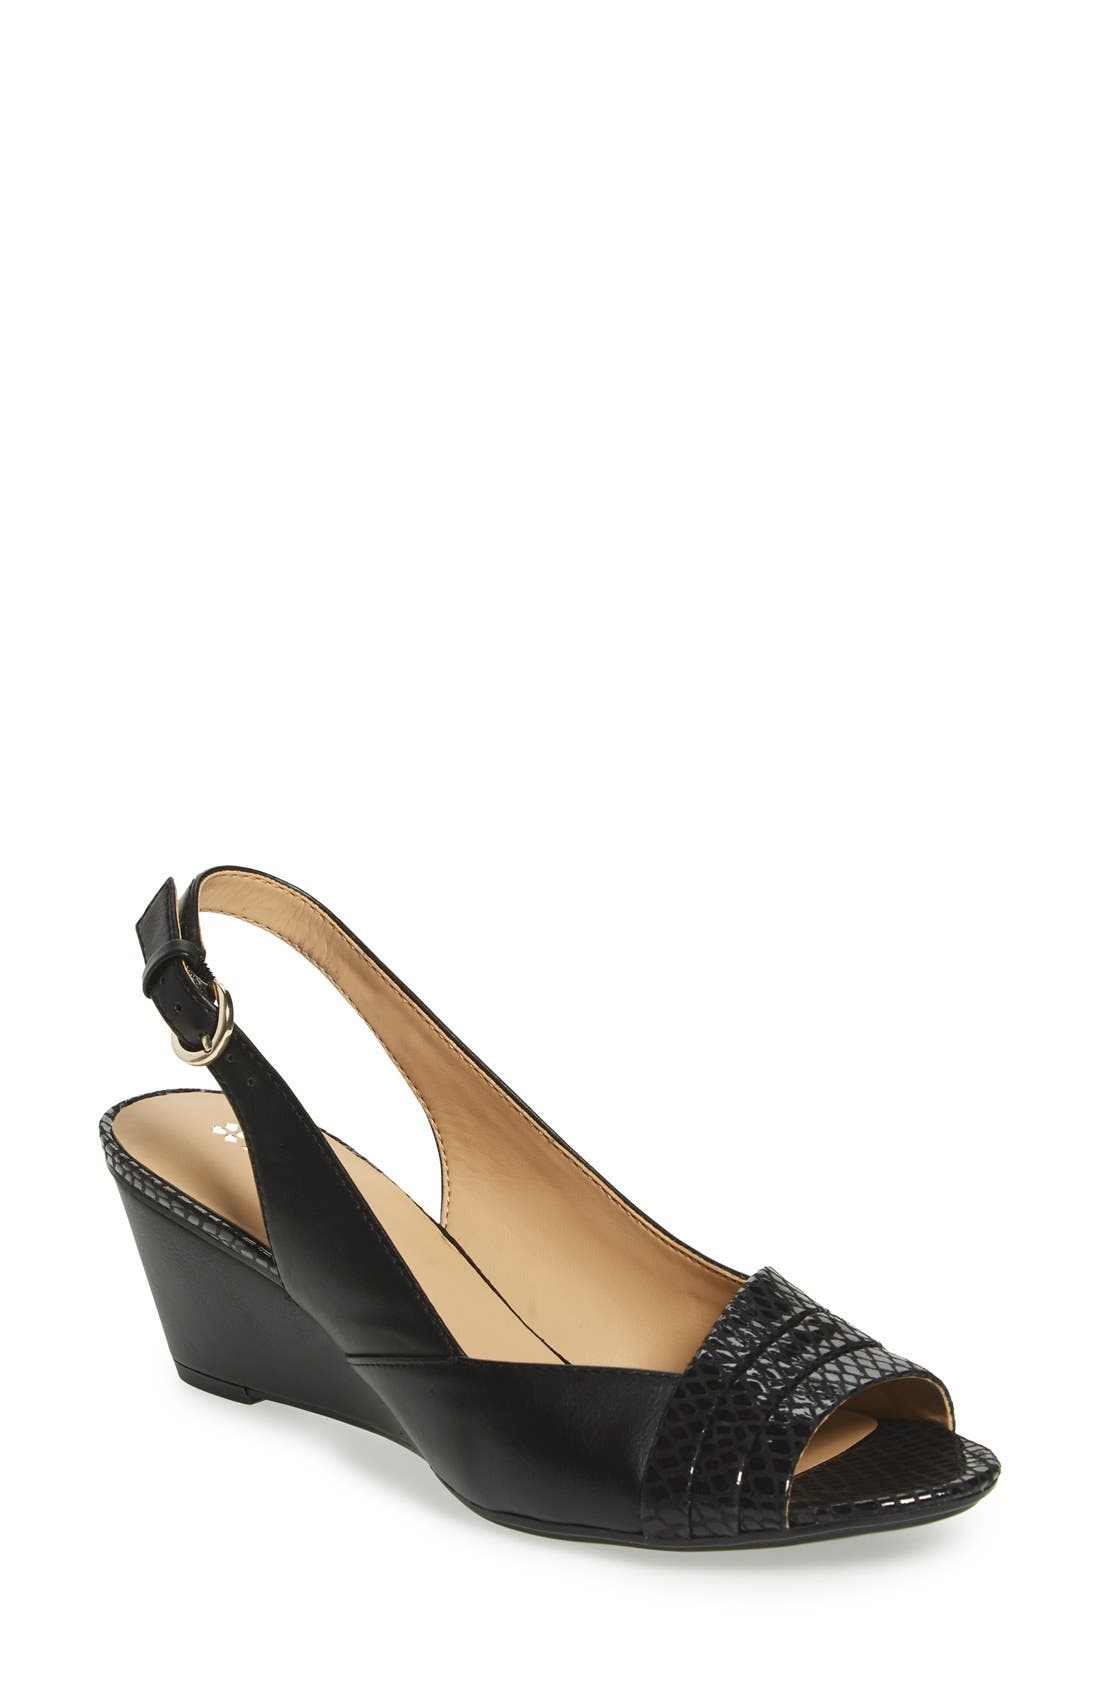 'Henny' Sandal, Main, color, 001